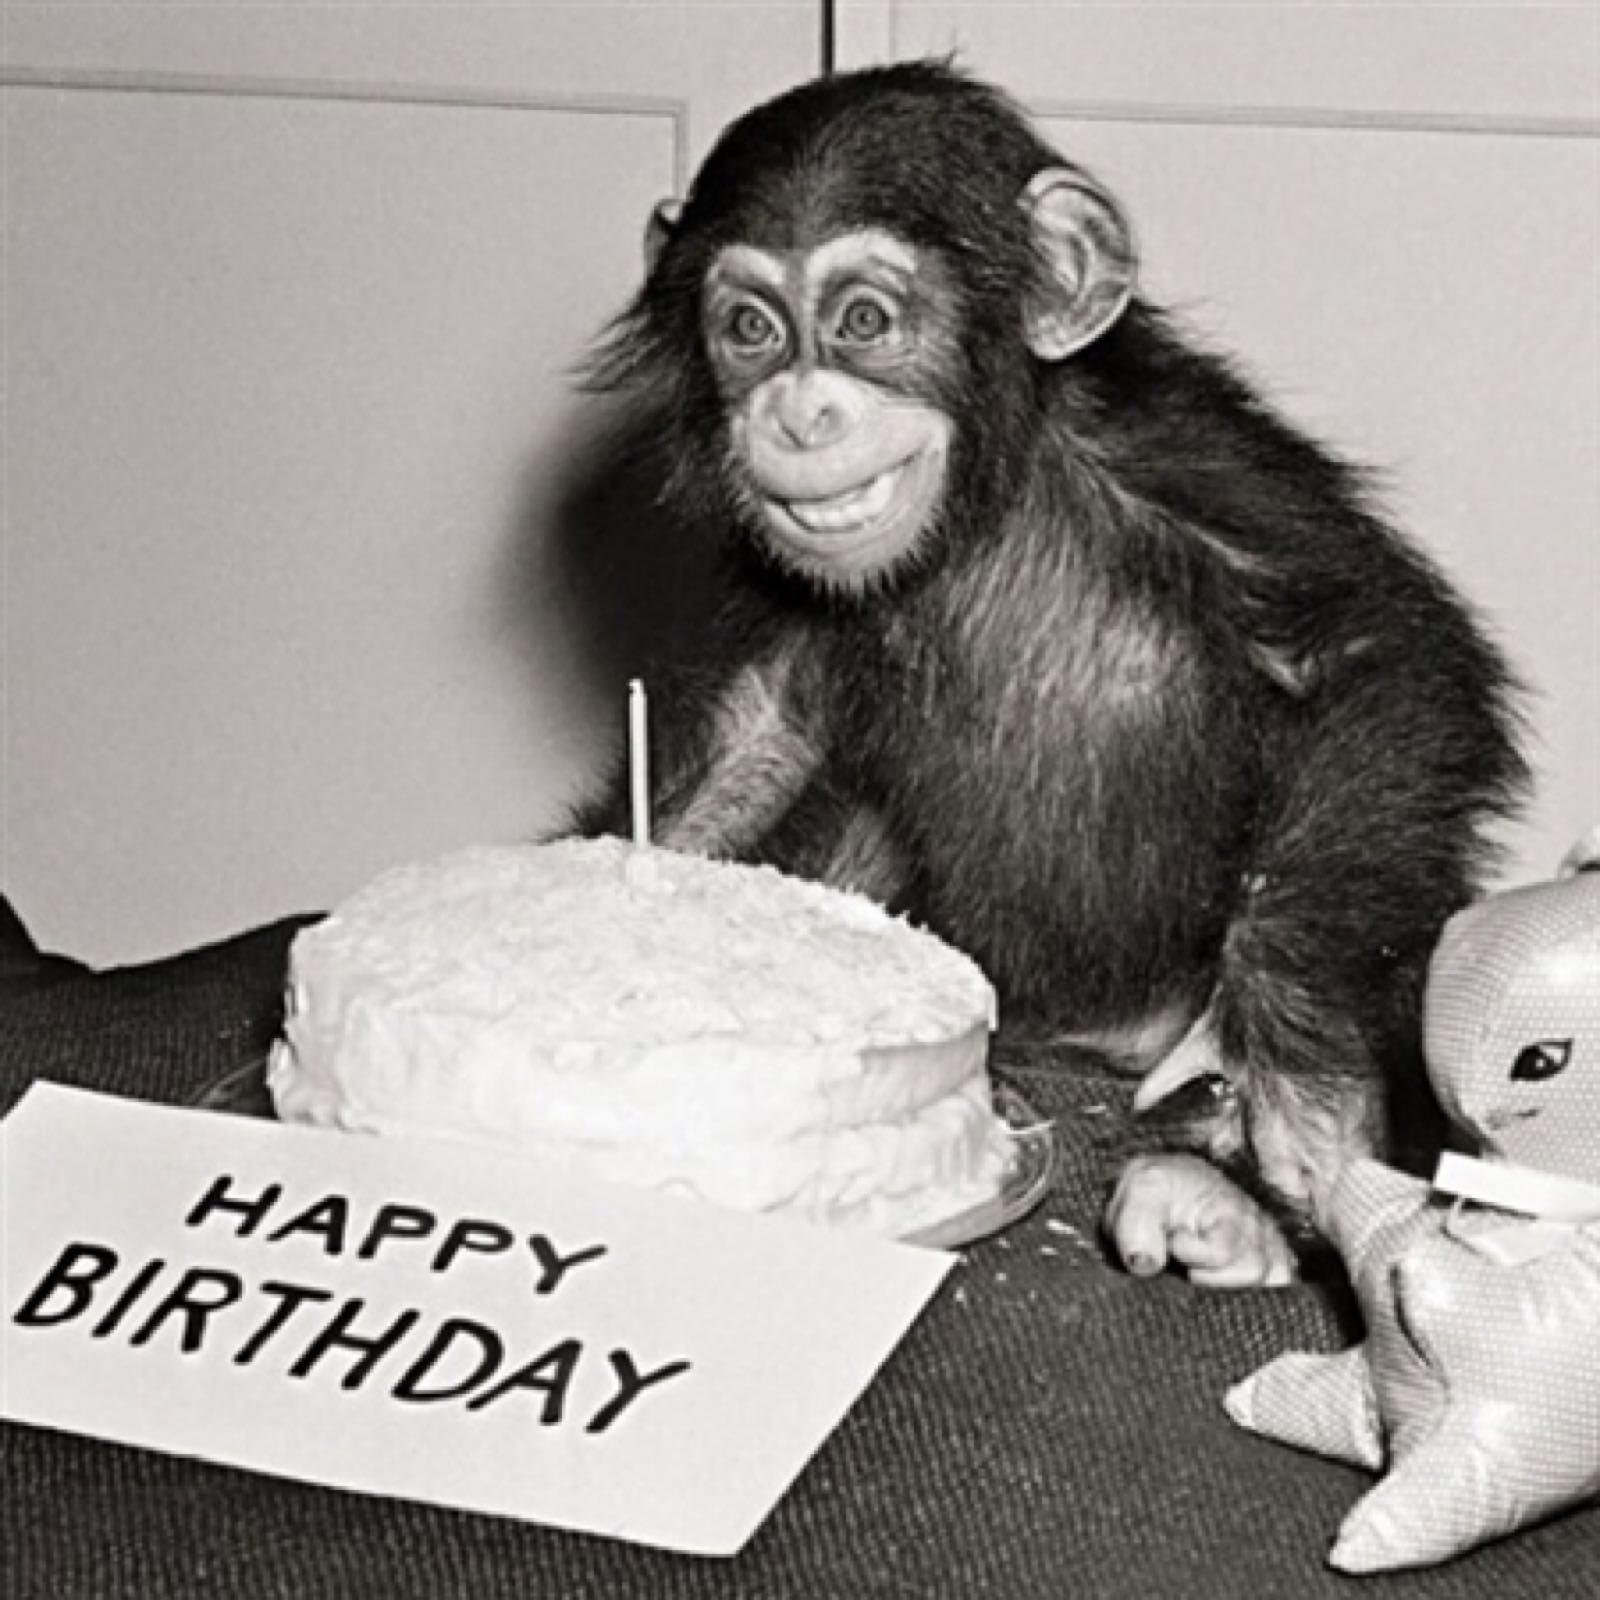 'Birthday Chimp' Exposure Card